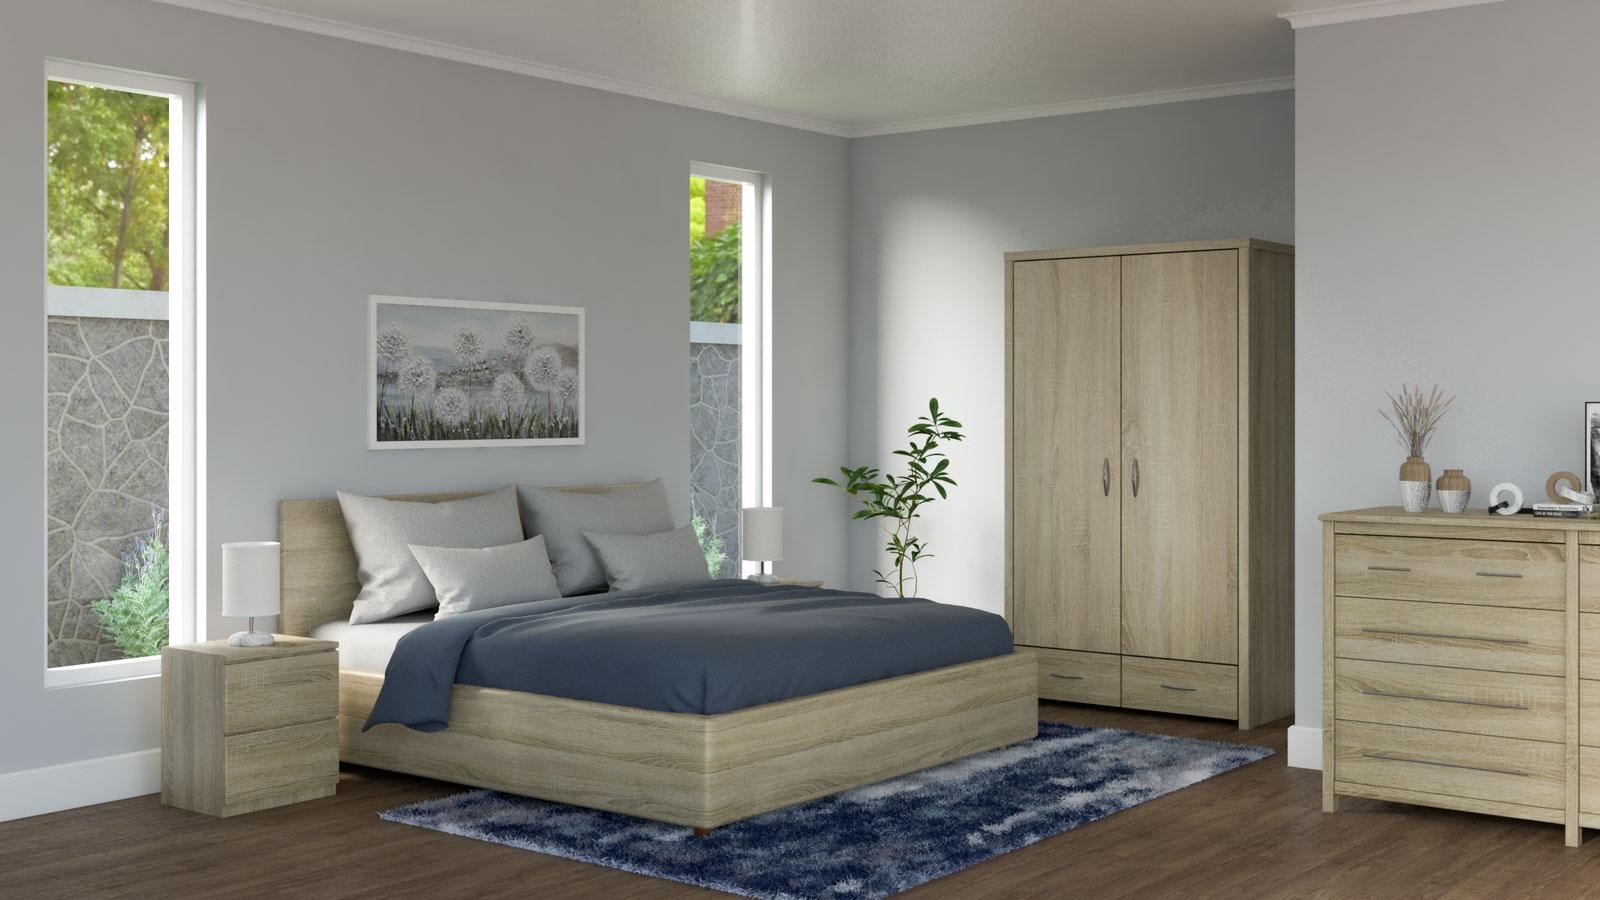 Oak bedroom with navy bedding ideas